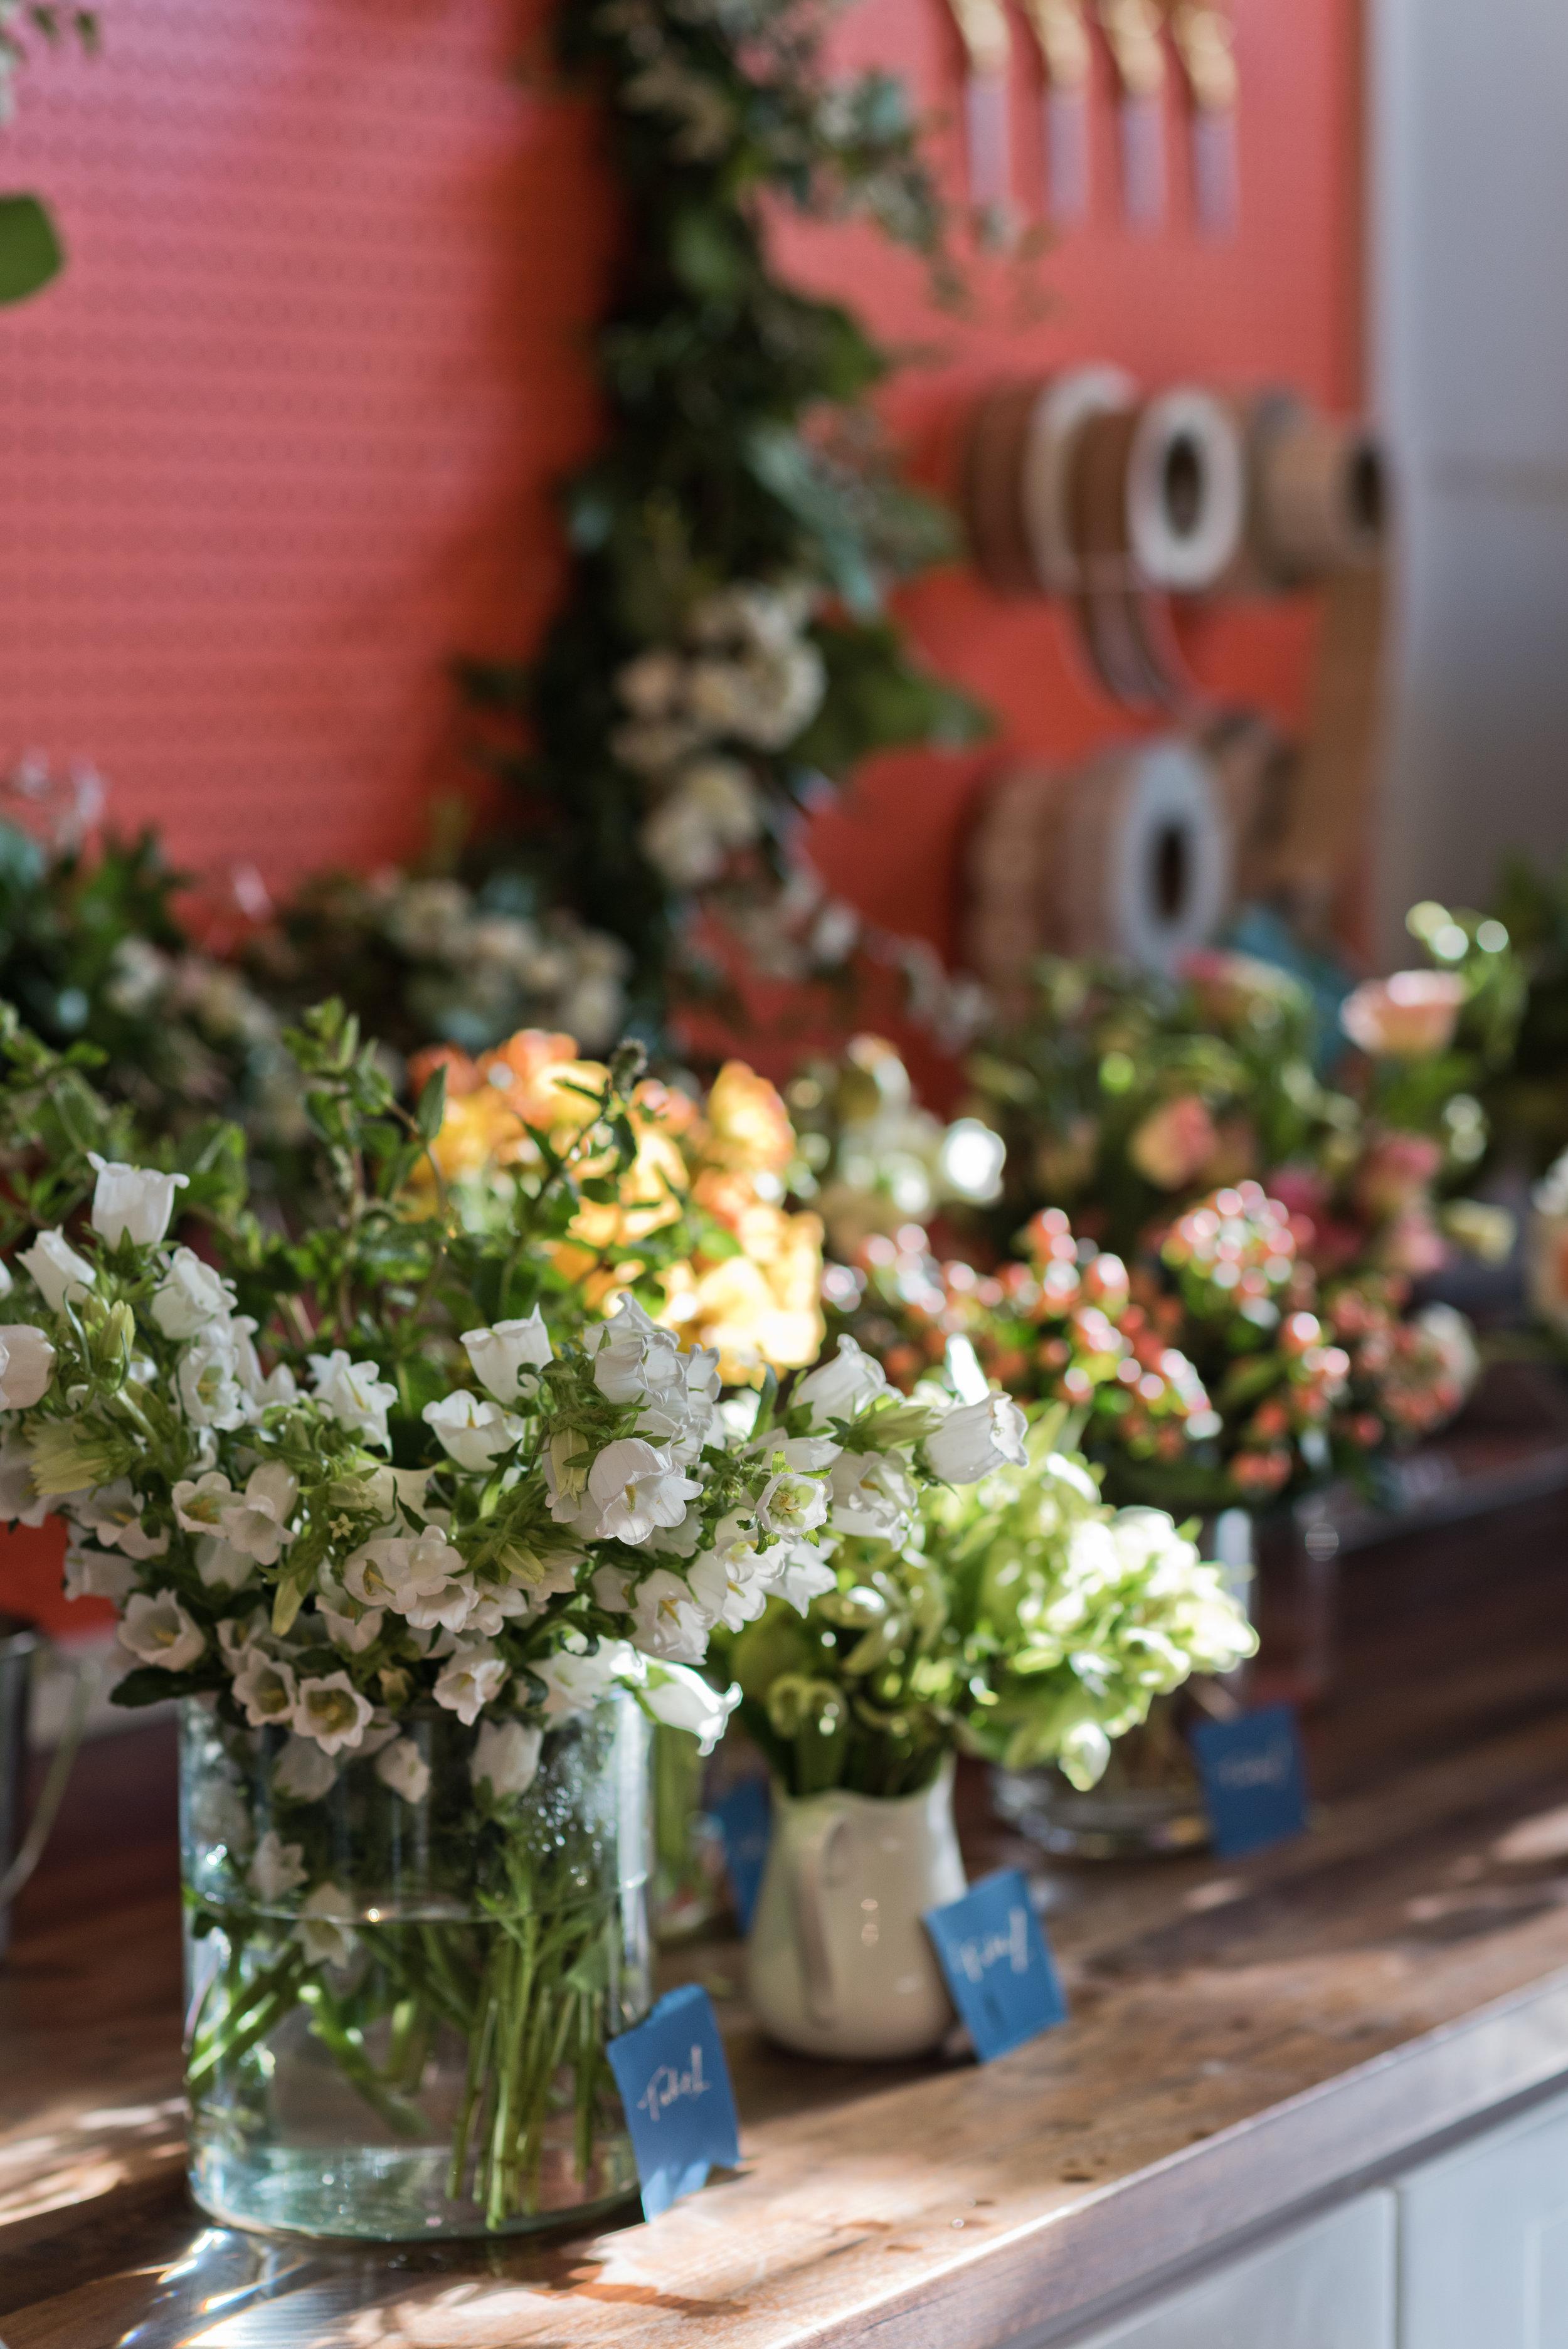 petal-and-fold-candlefish-workshop-july-2018-6.jpg